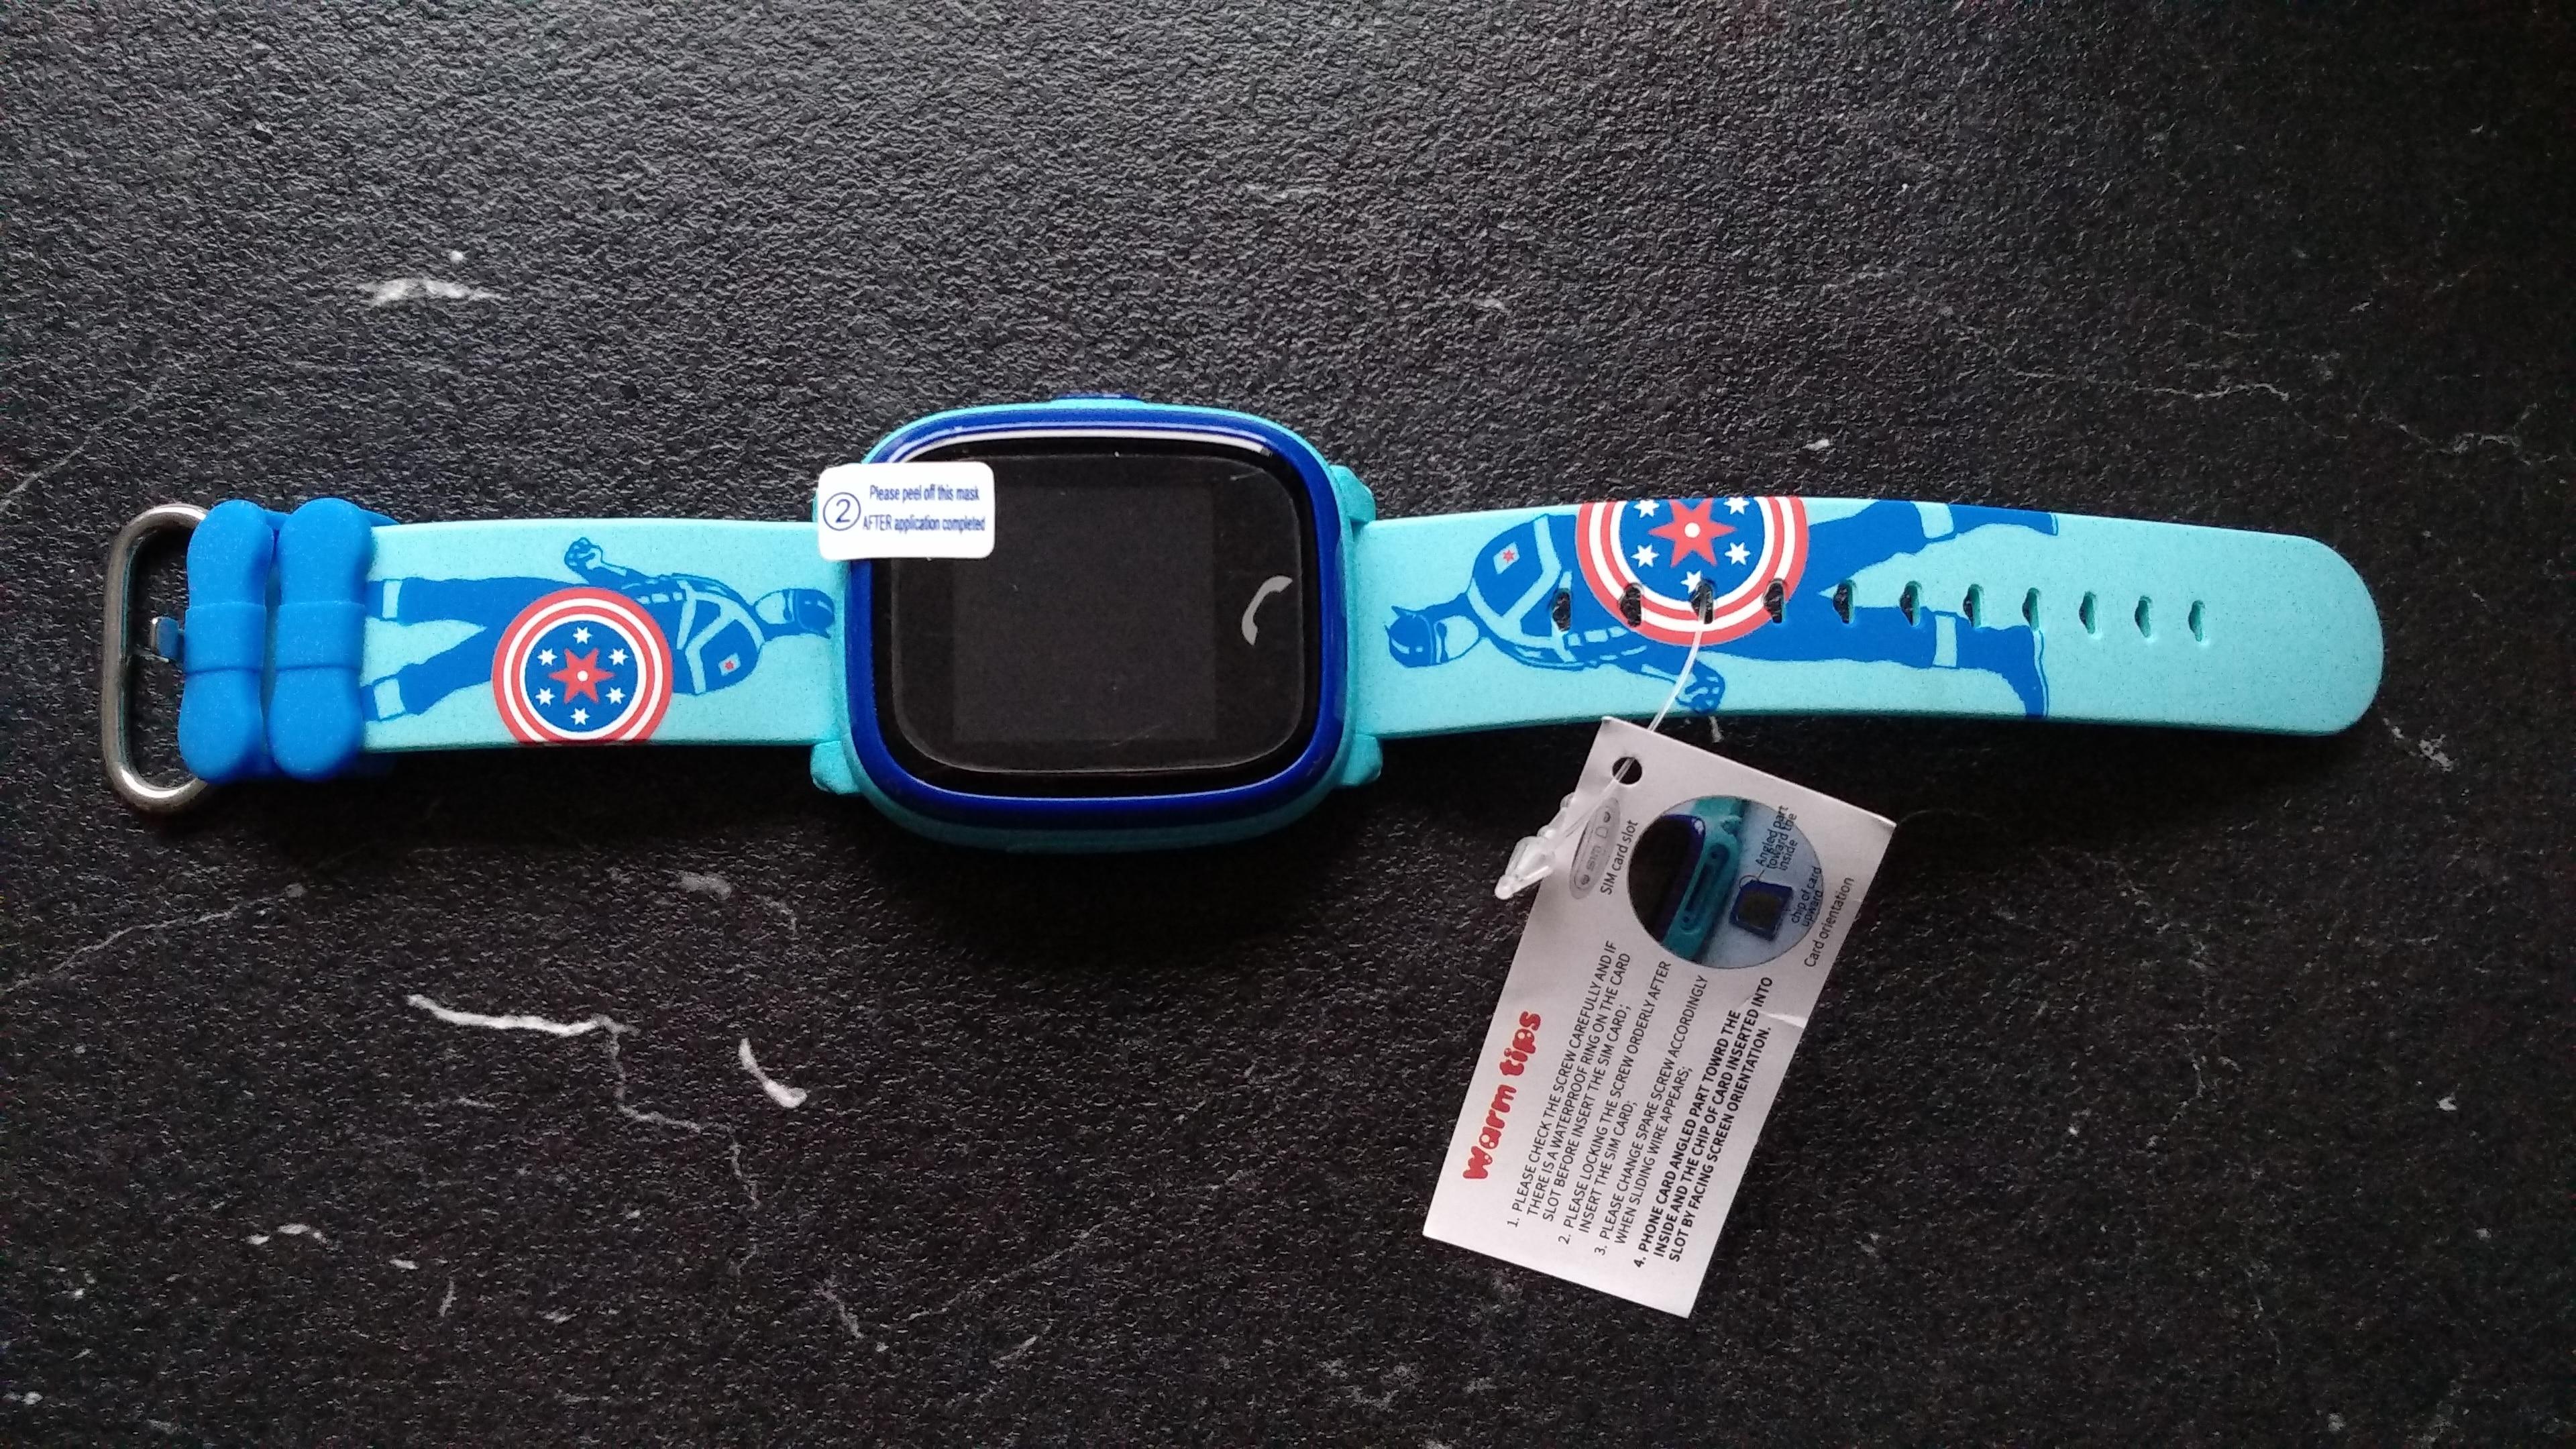 DF25 Children GPS Phone smart watch baby watch Swim IP67 Waterproof SOS Call Location Device Tracker Kids Safe Anti Lost Monitor|smart watch|watch sosphone smart watch - AliExpress